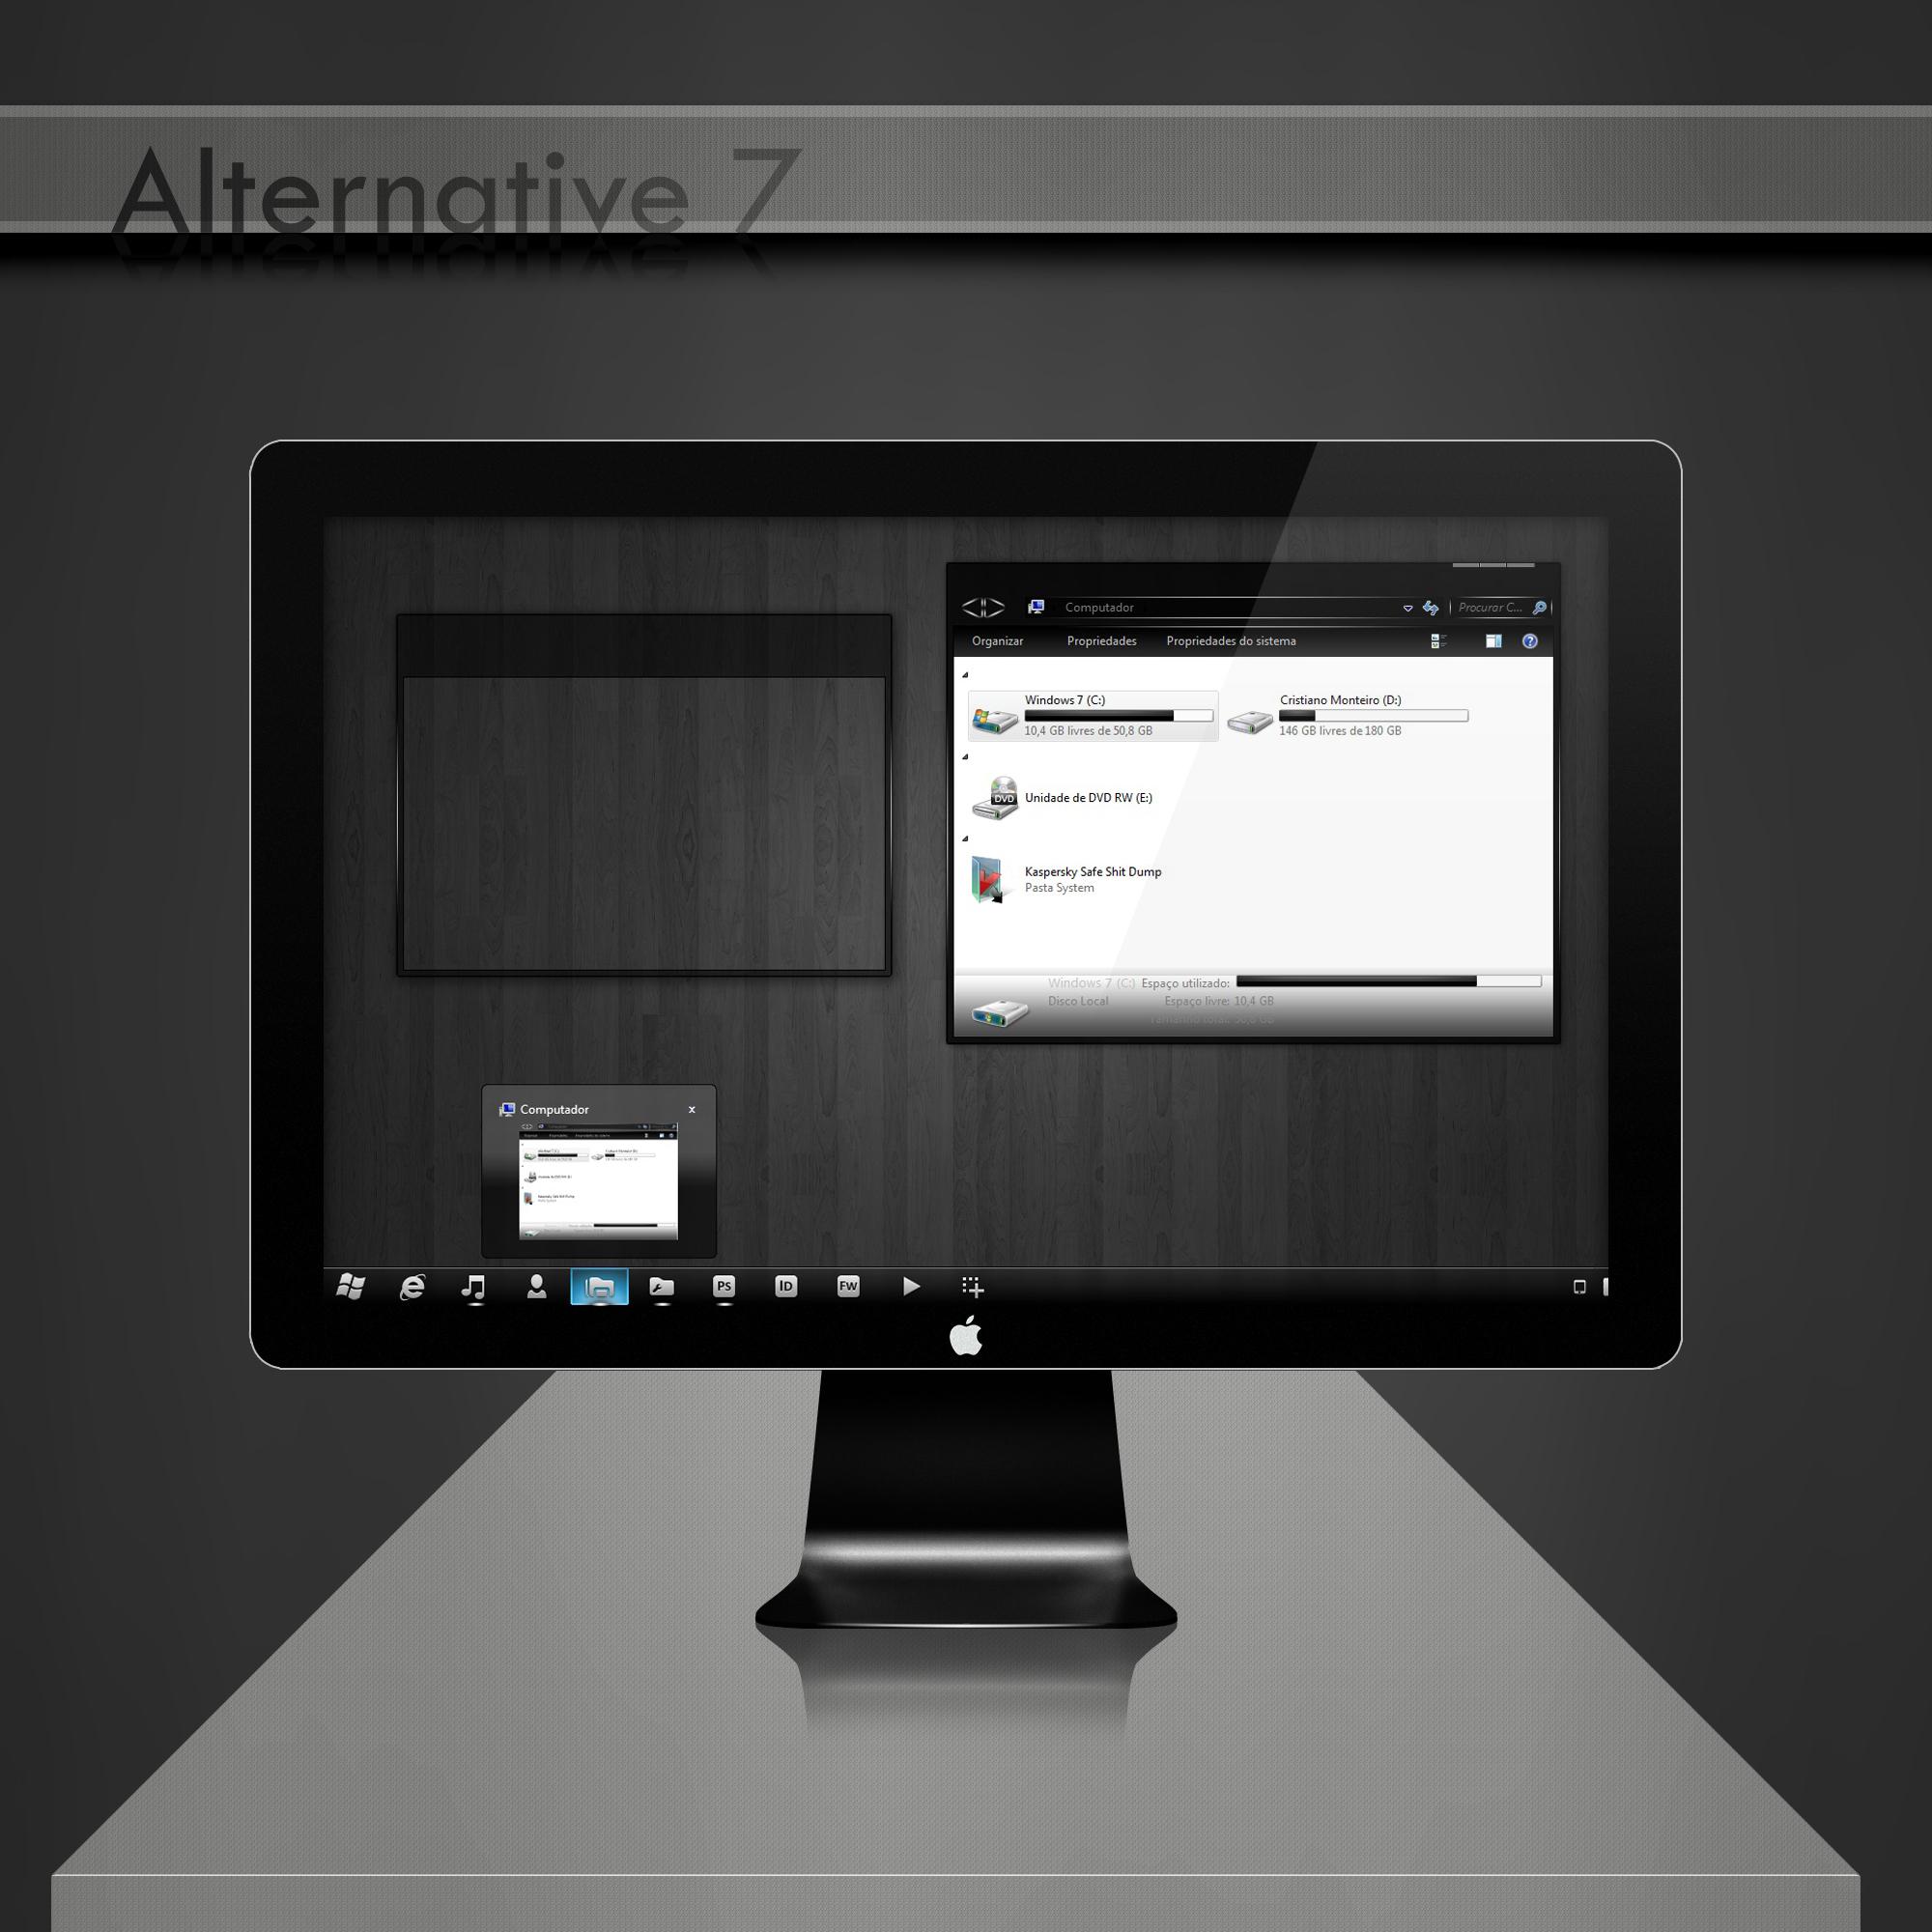 Windows 7 Alternative